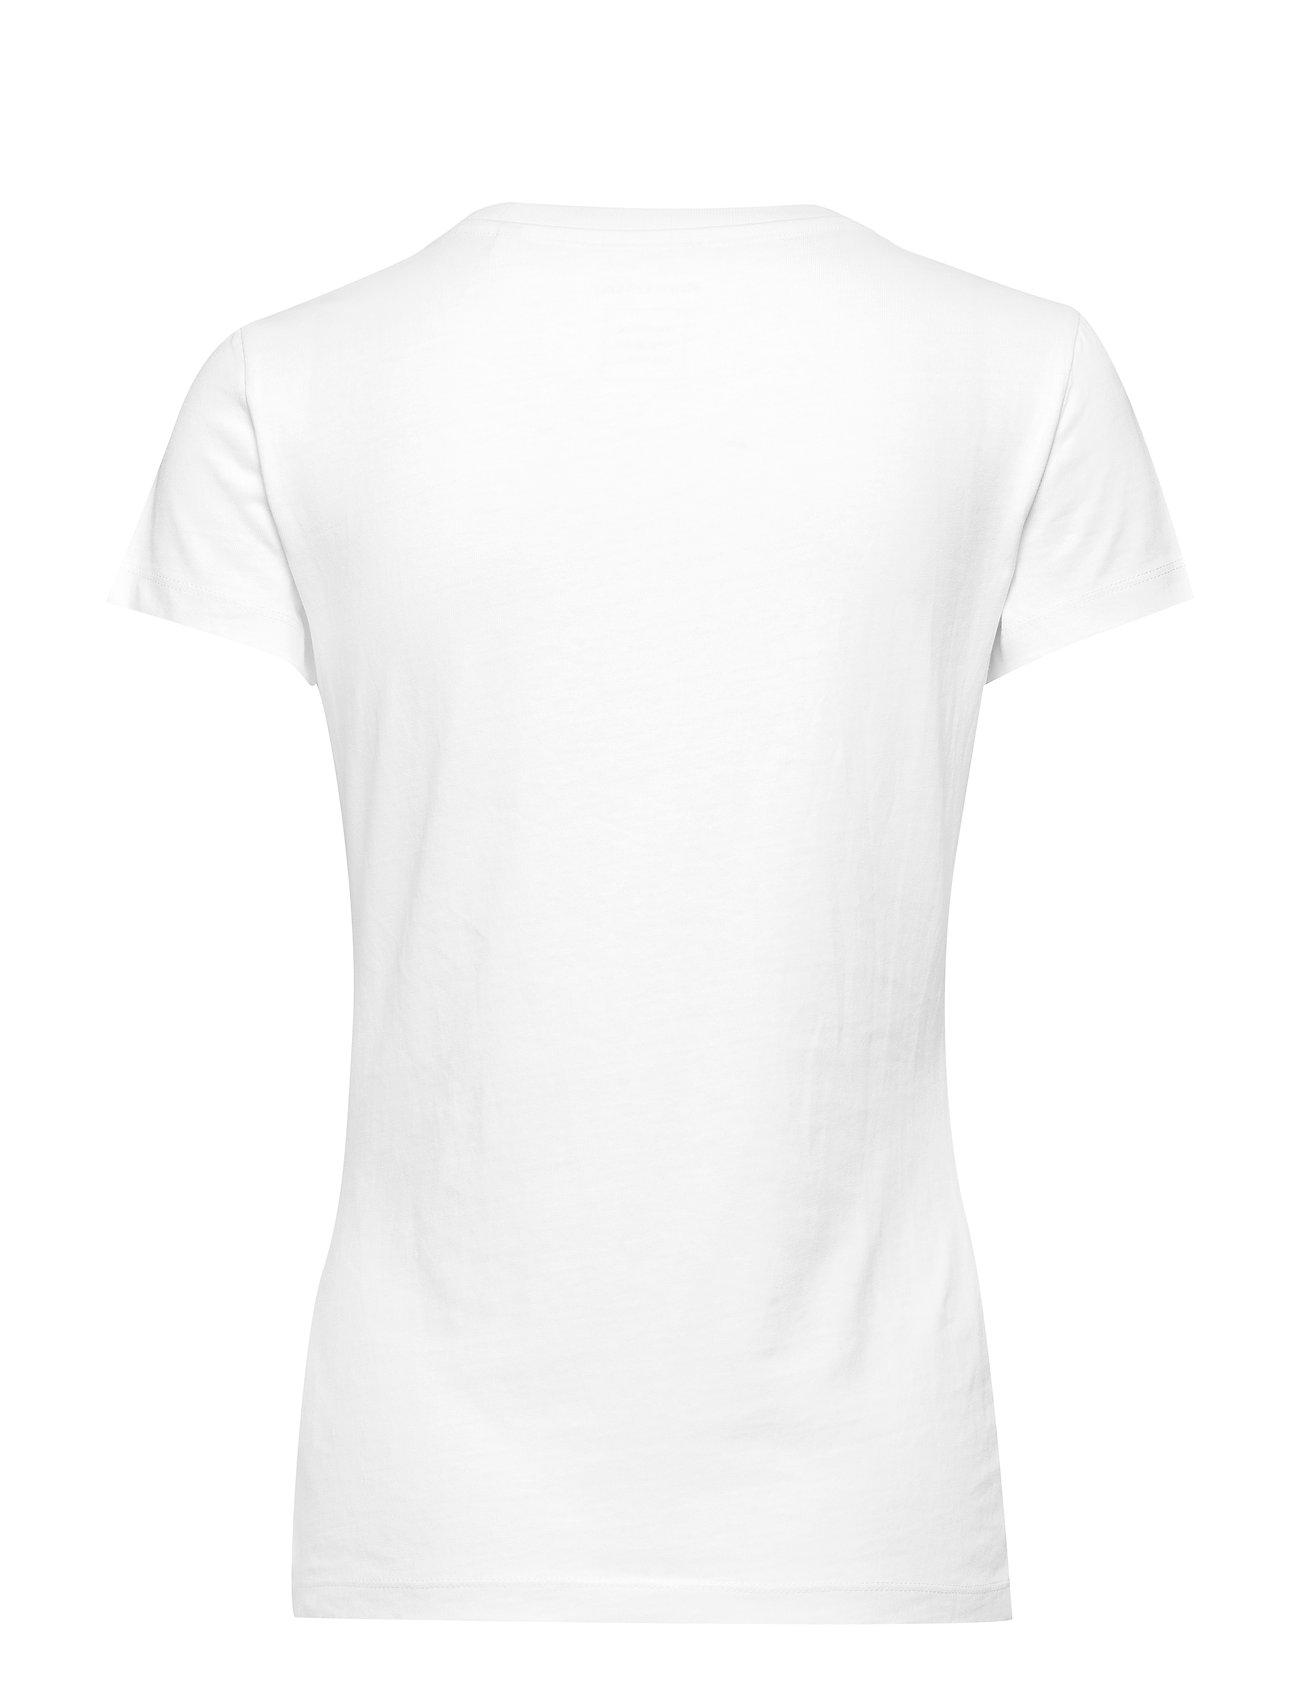 O'polo T T Short SleevewhiteMarc shirt 6gv7IYbmfy